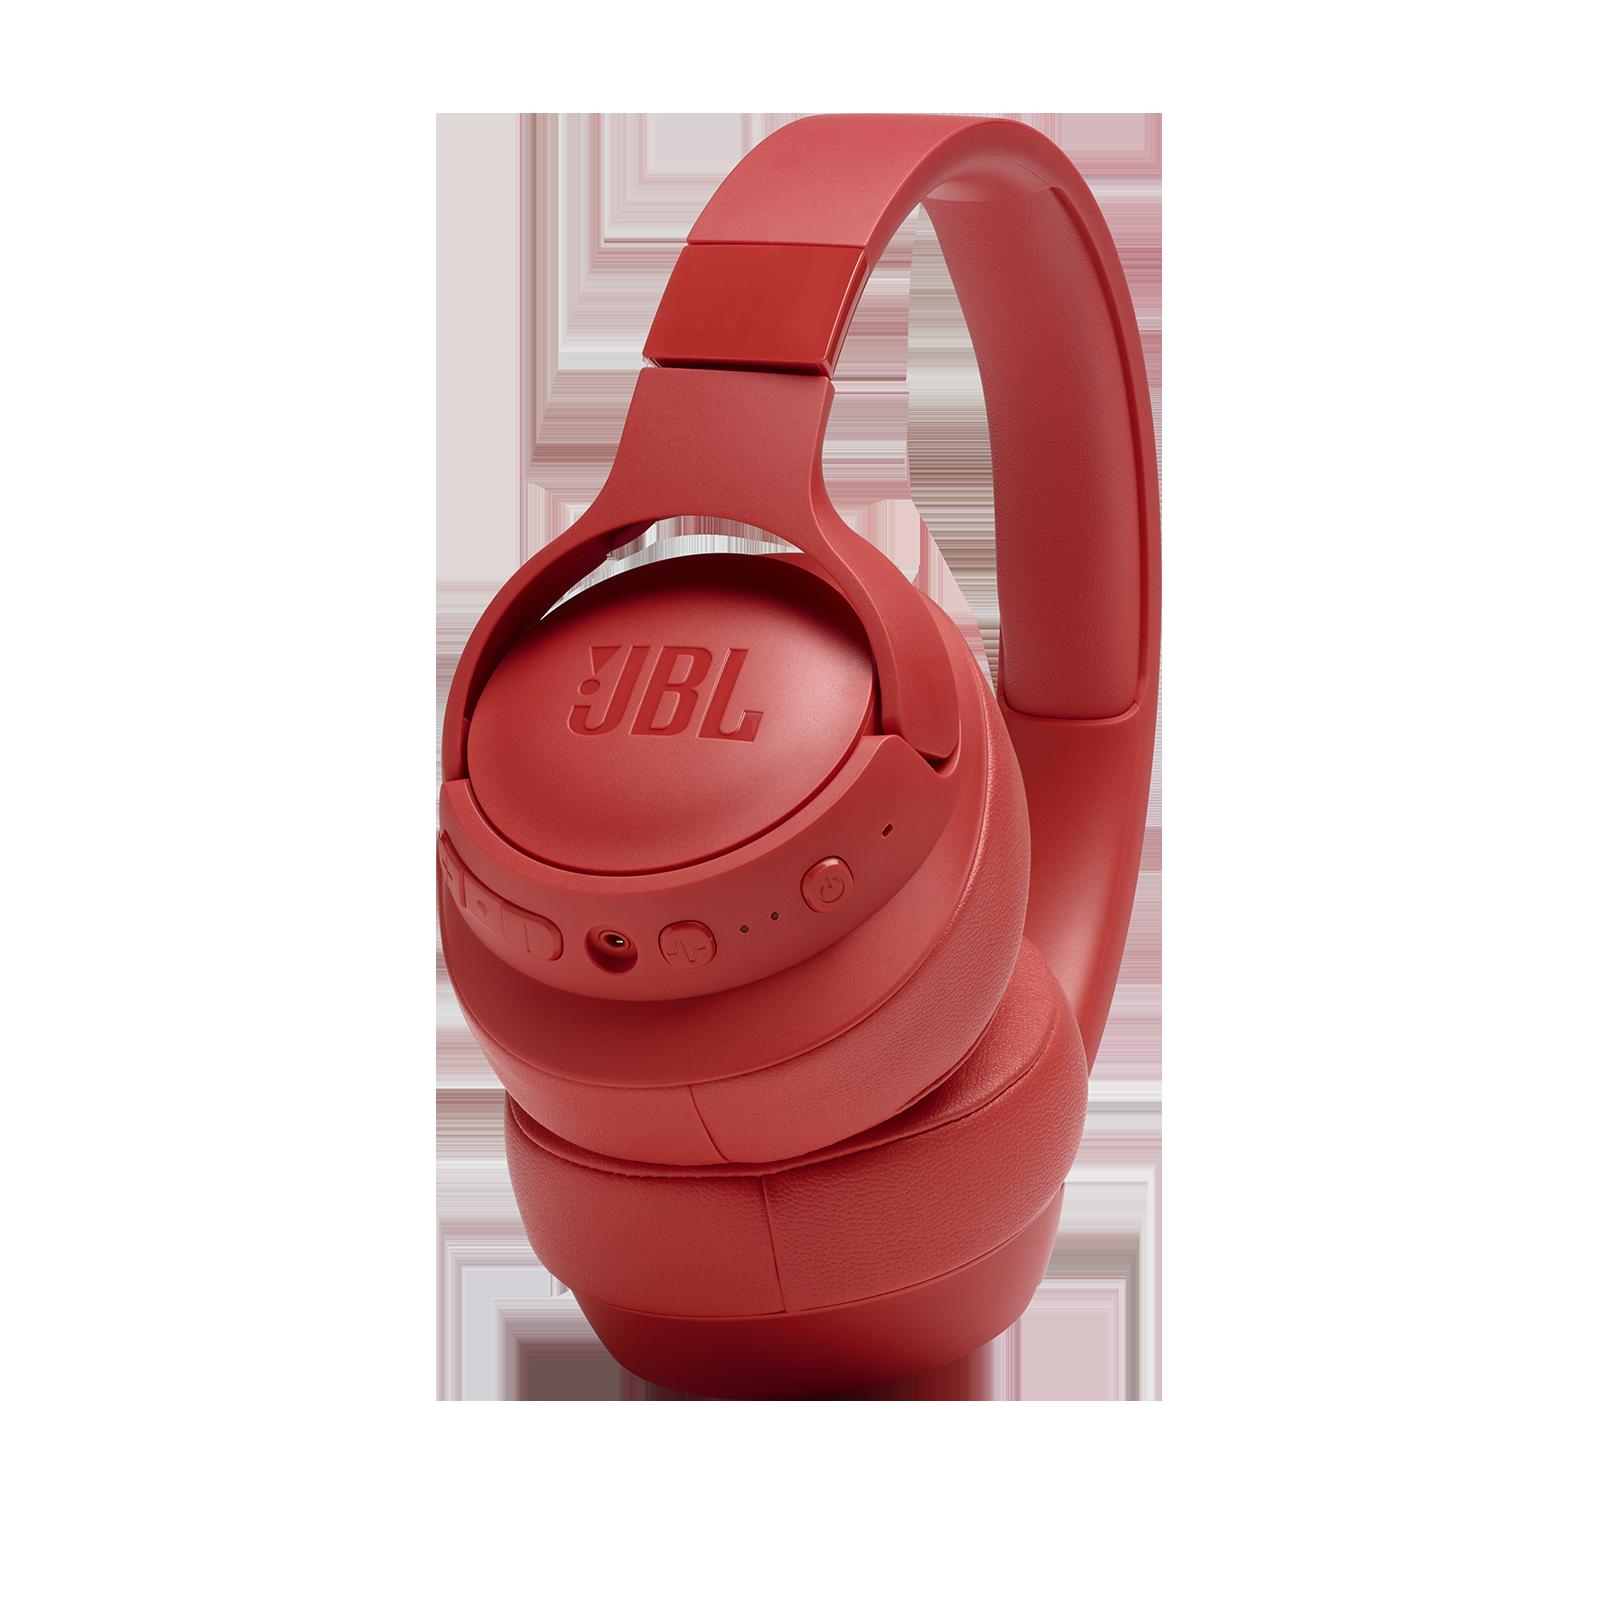 JBL TUNE 750BTNC - Coral Orange - Wireless Over-Ear ANC Headphones - Detailshot 6